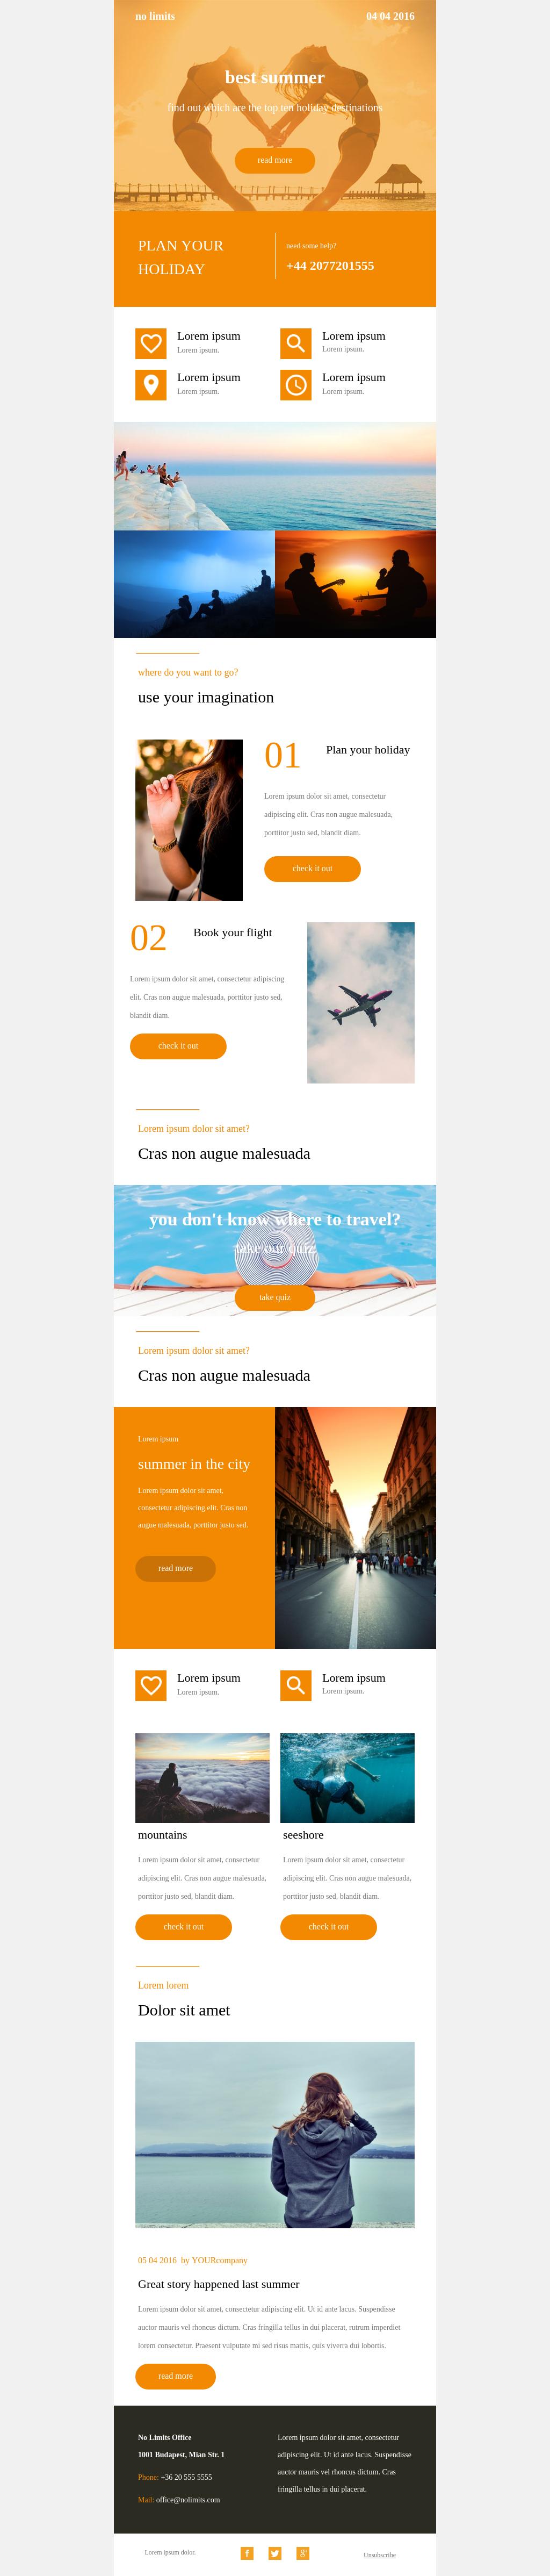 Summer travel newsletter template